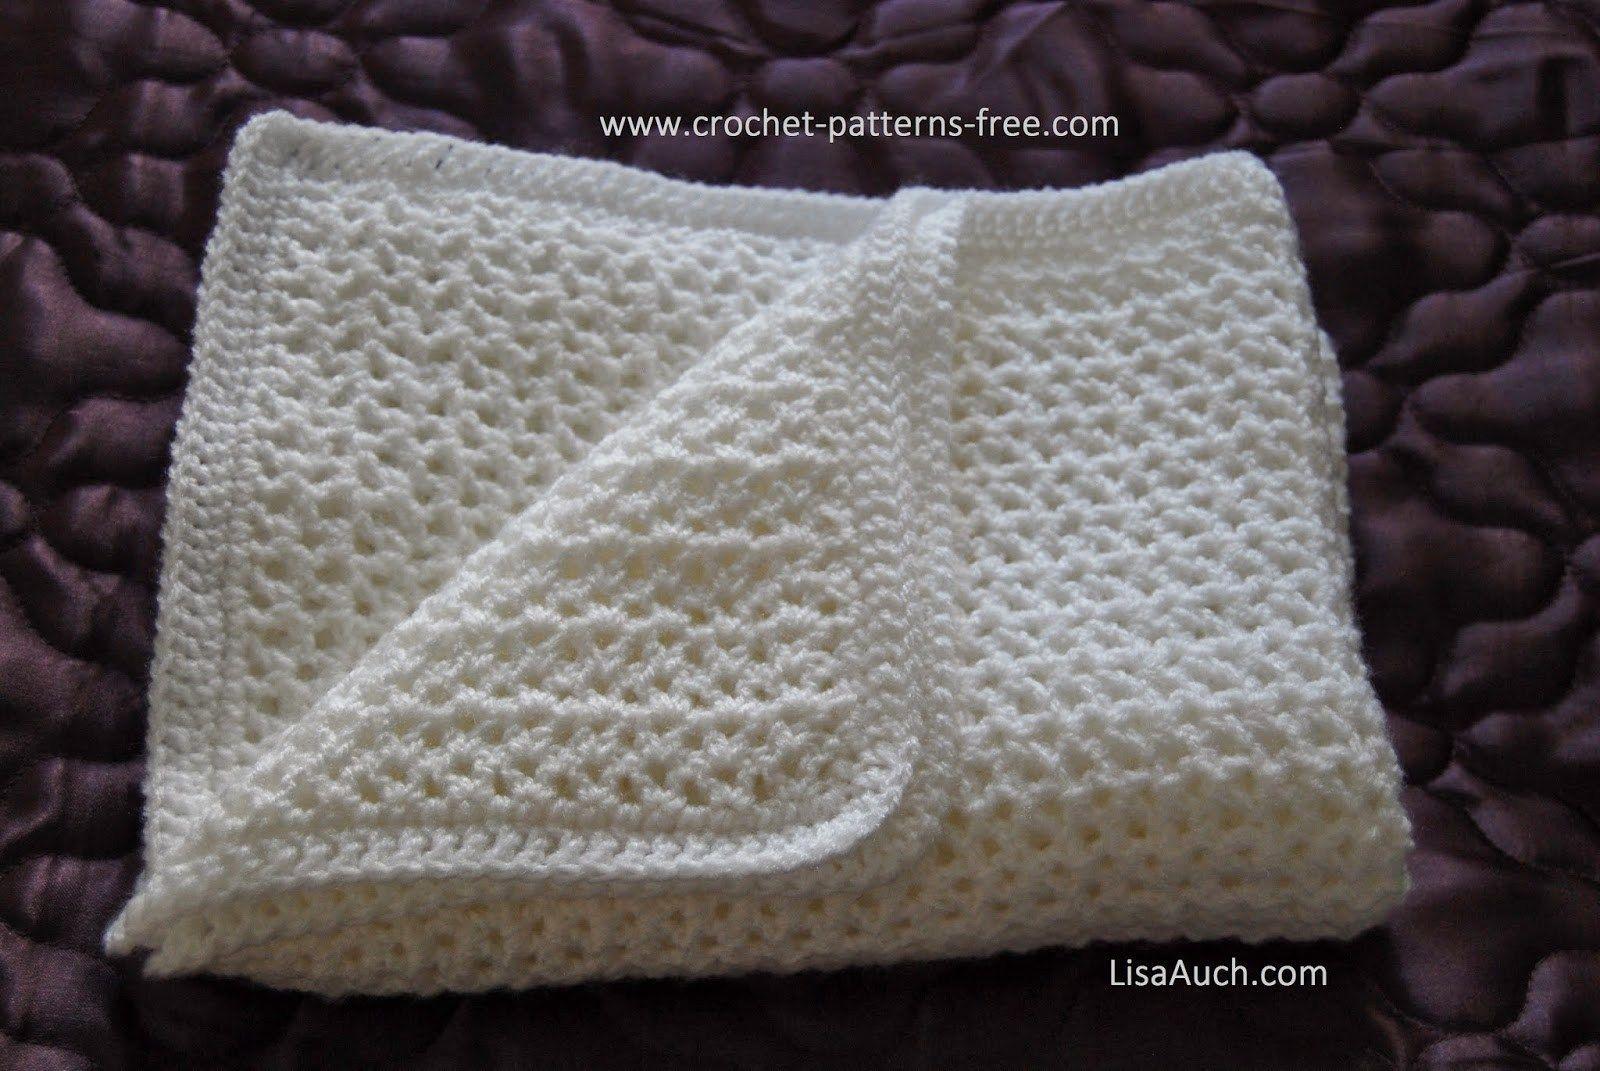 Easy Crochet V Stitch Crocheted Baby Afghan ~ Free Crochet Patterns ...